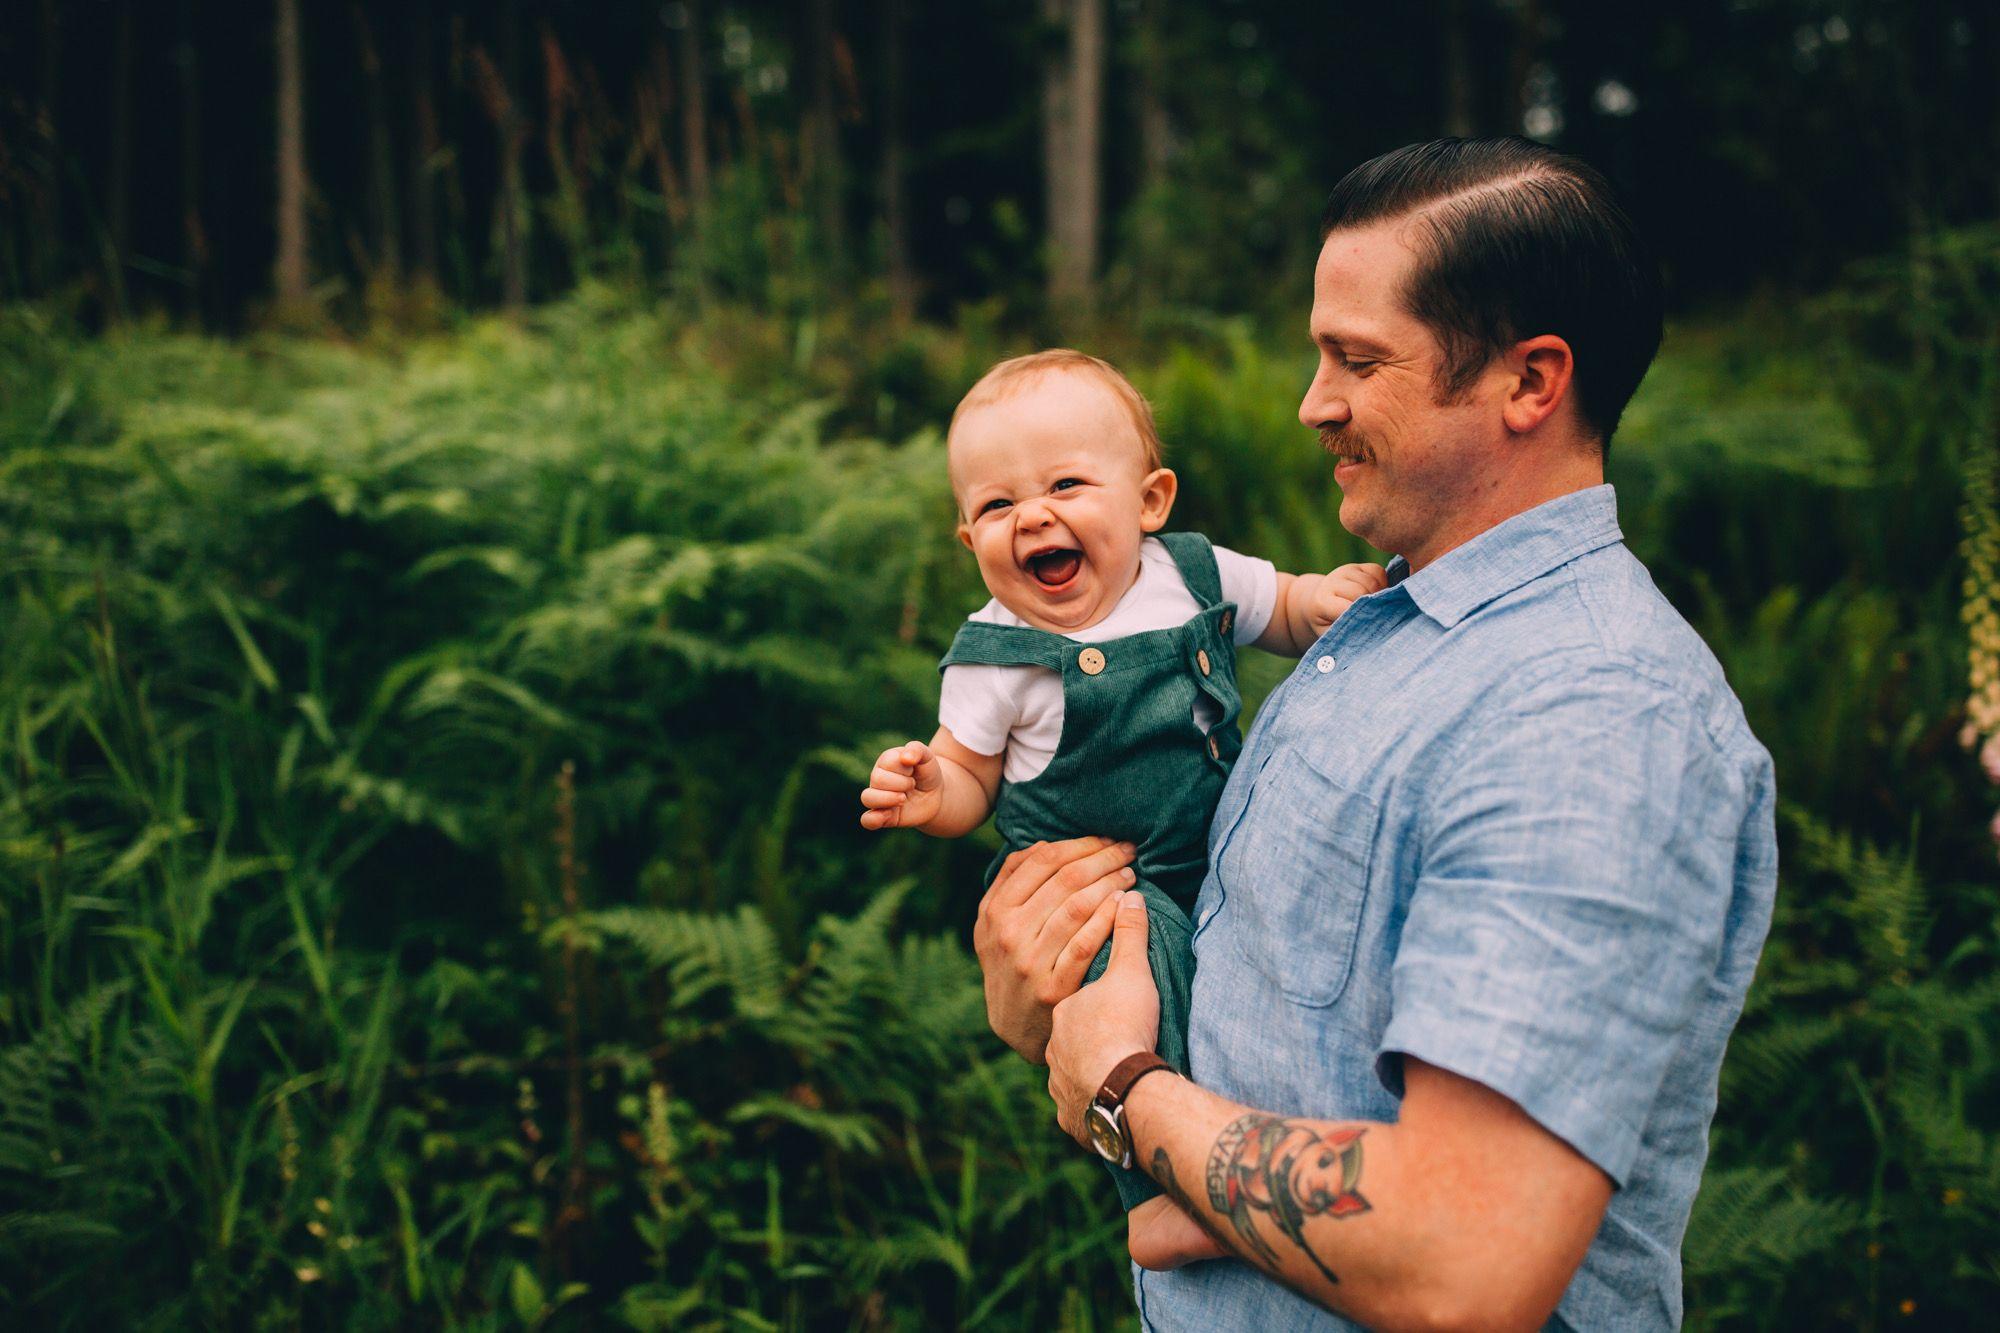 Morgan Locke Photography  Lifestyle Family Photographer  Washington Photographer  #pnwphotographer #washingtonfamilyphotographer #tacomaphotographer #seattlephotographer